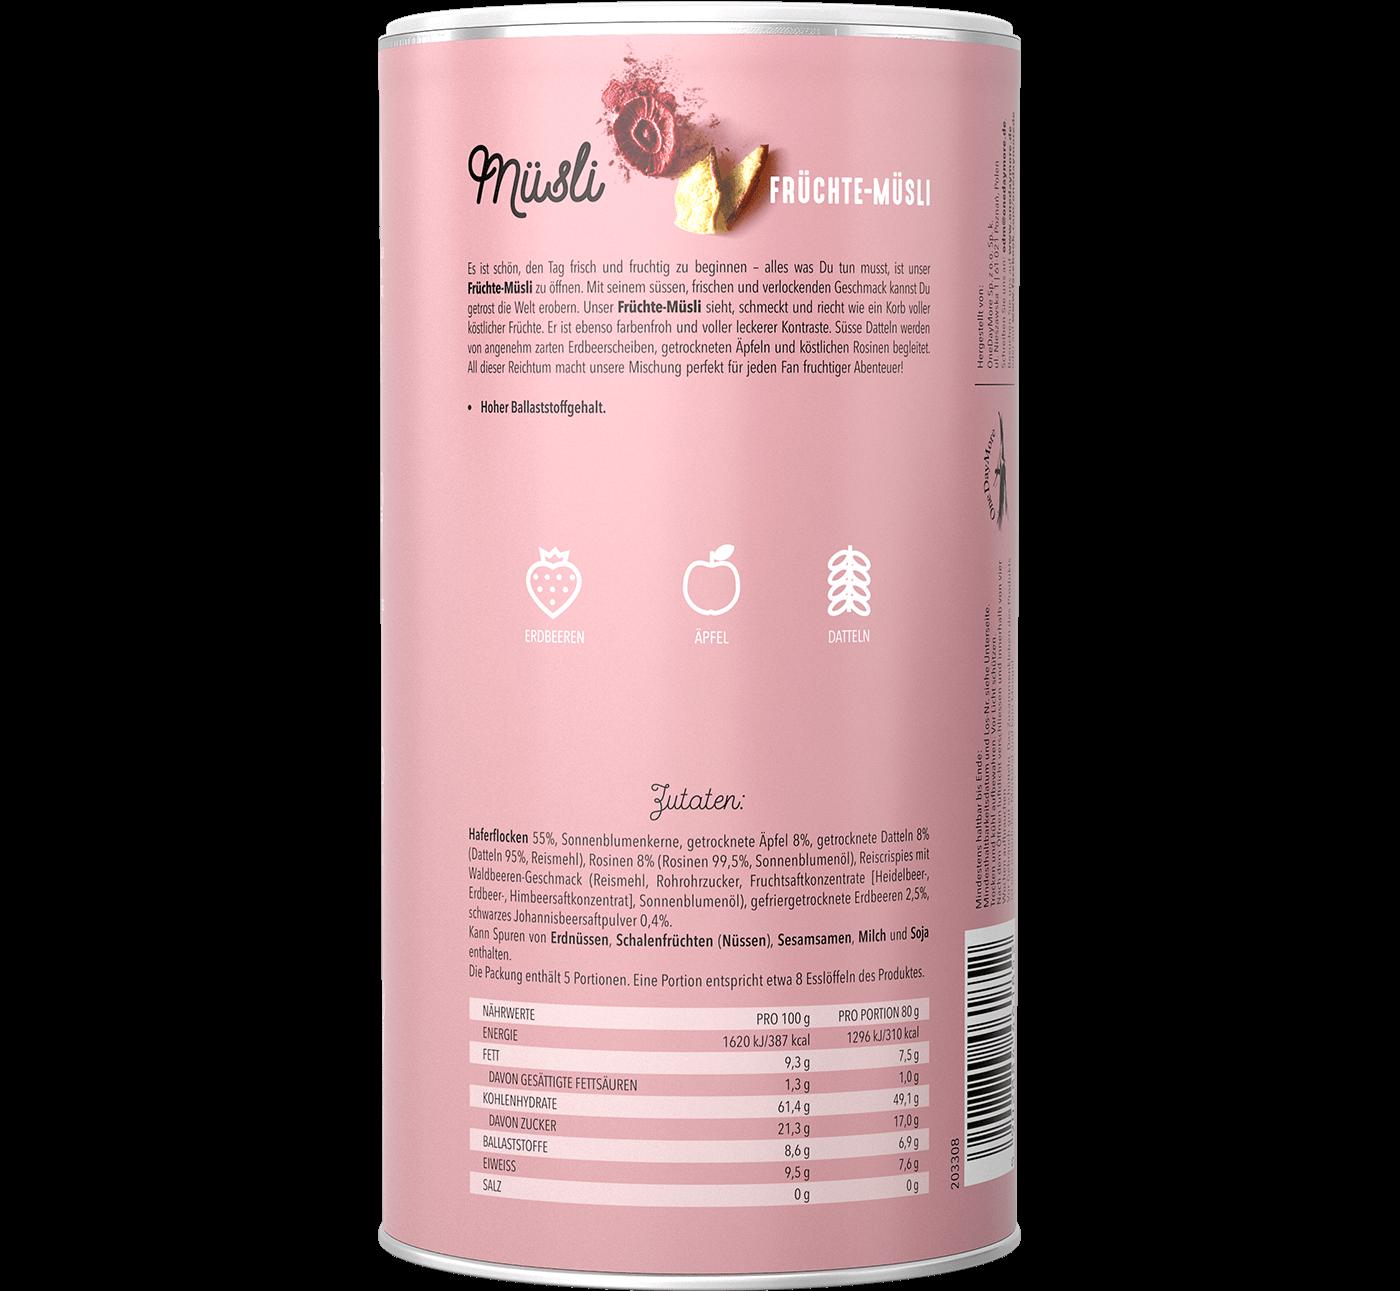 fruchte-musli-onedaymore-tyl-tuba-1400×1291